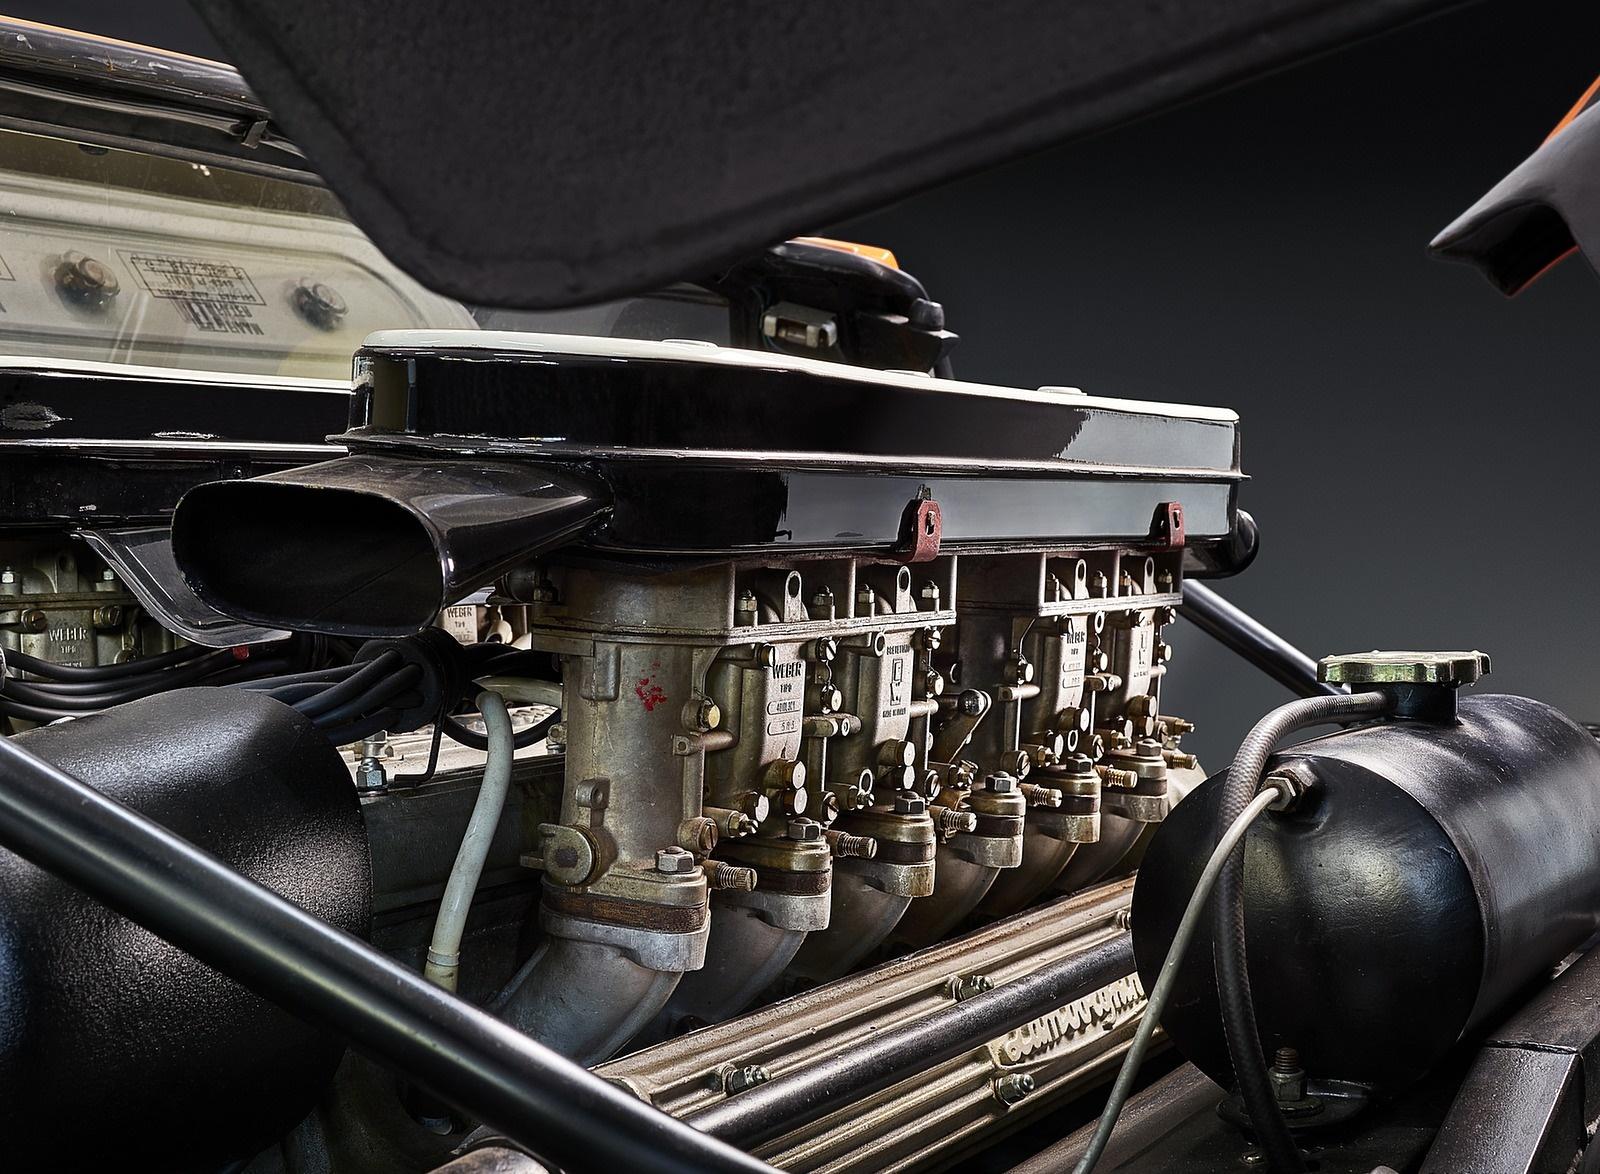 1969 Lamborghini Miura P400 Engine Wallpaper 6 Hd Wallpapers